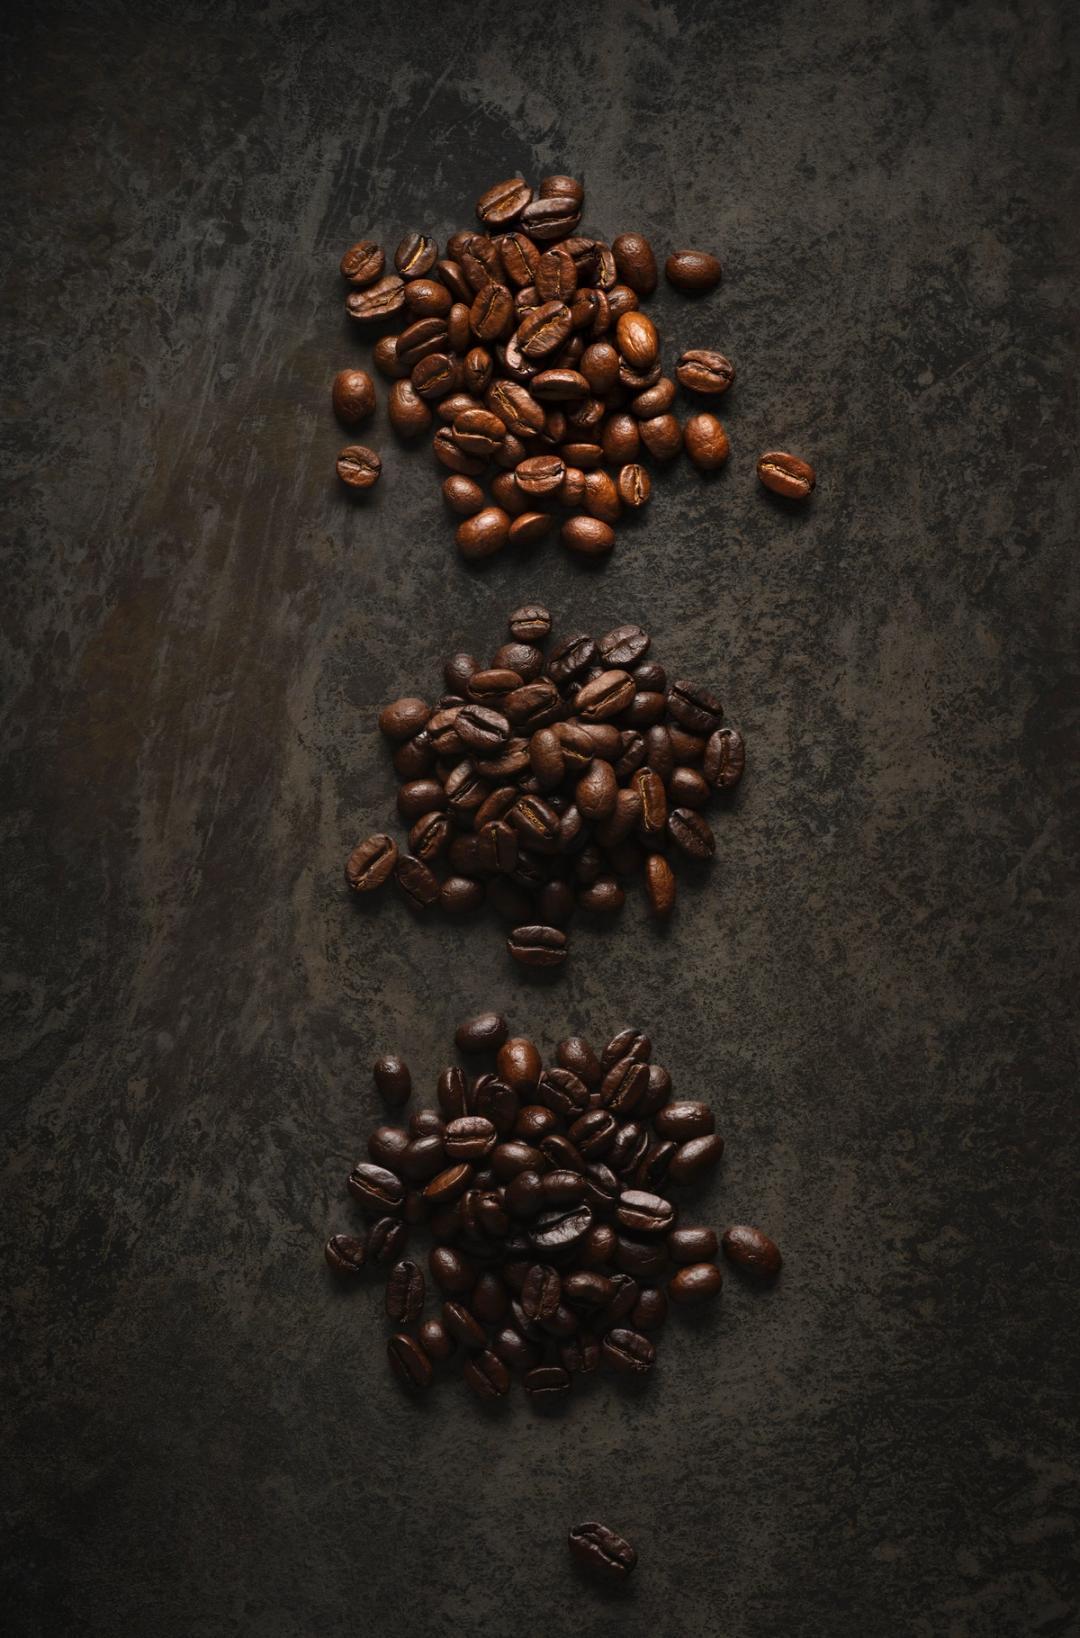 Light, medium and dark Coffee beans